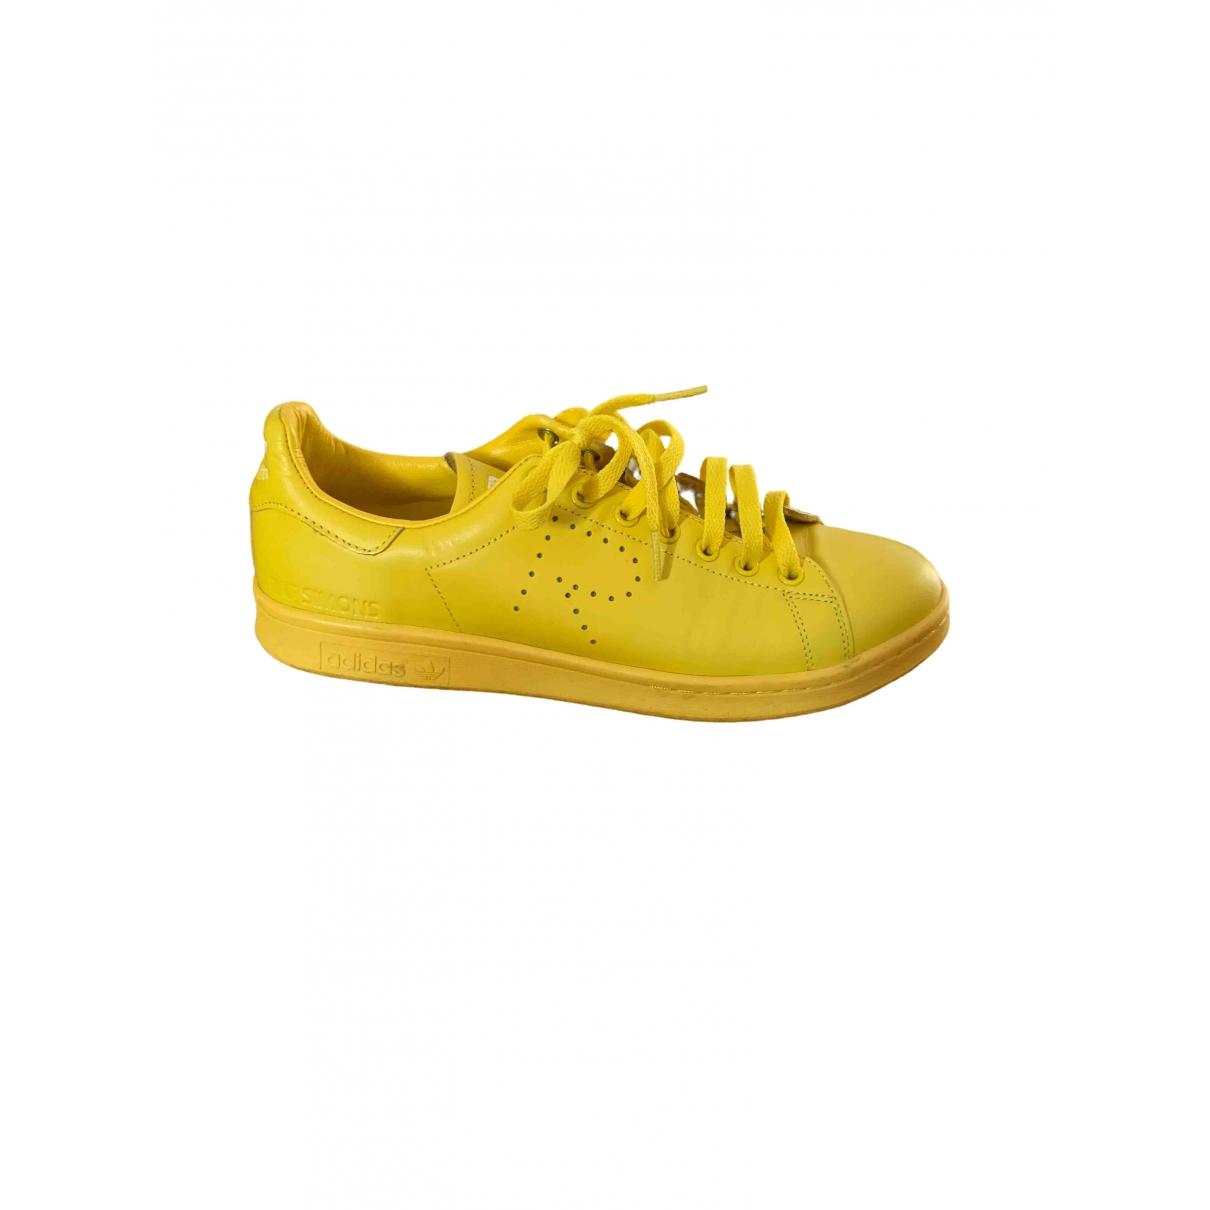 Adidas X Raf Simons Stan Smith Sneakers in  Gelb Leder